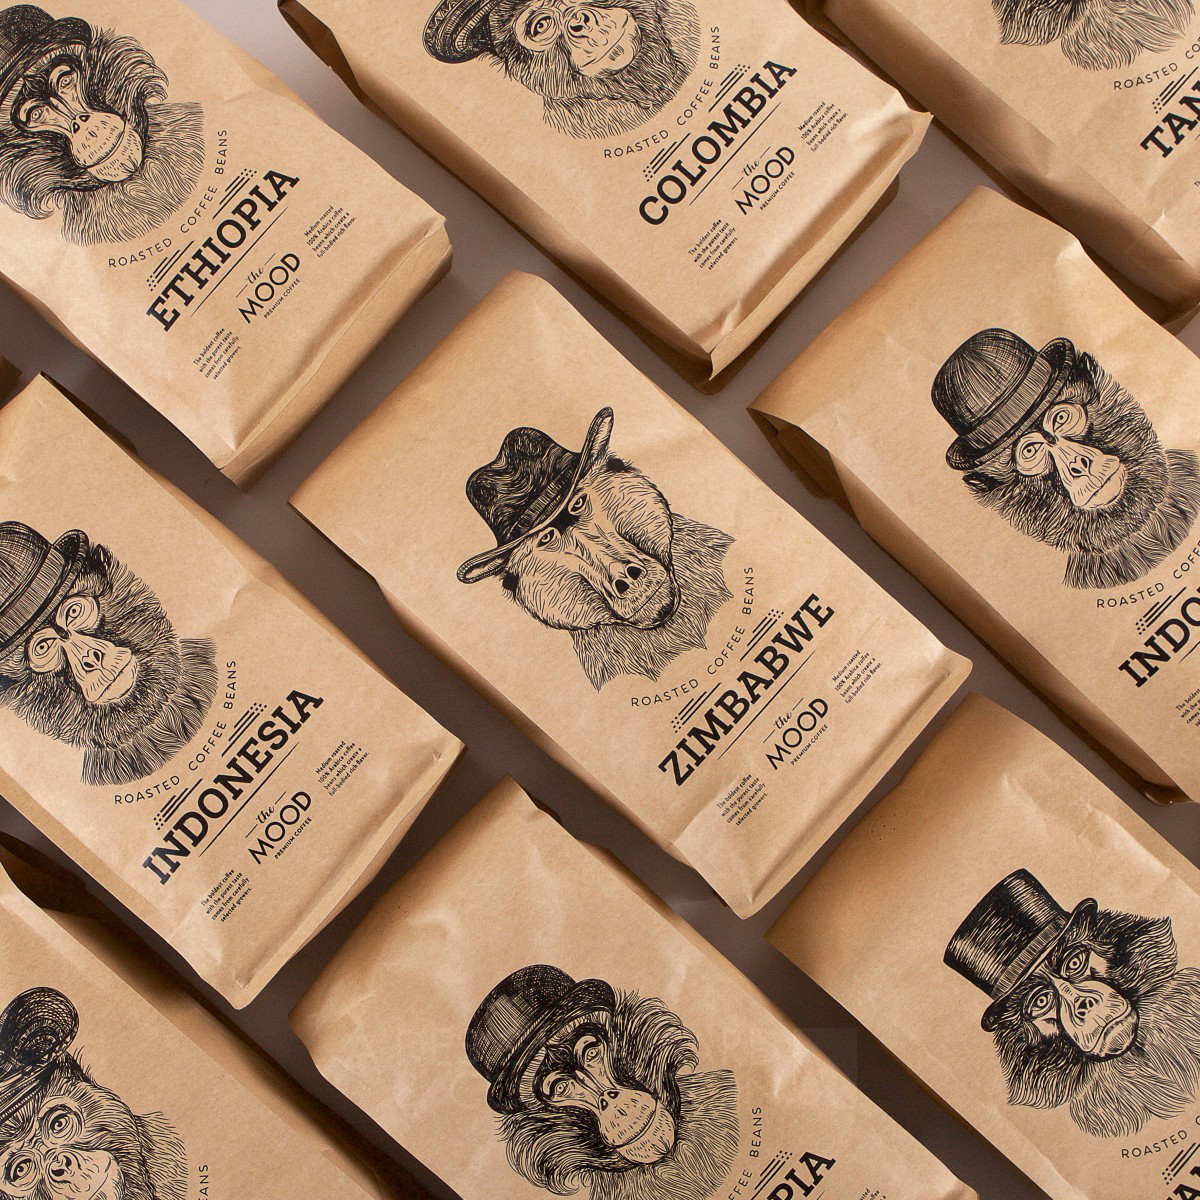 The Mood Coffee Packaging